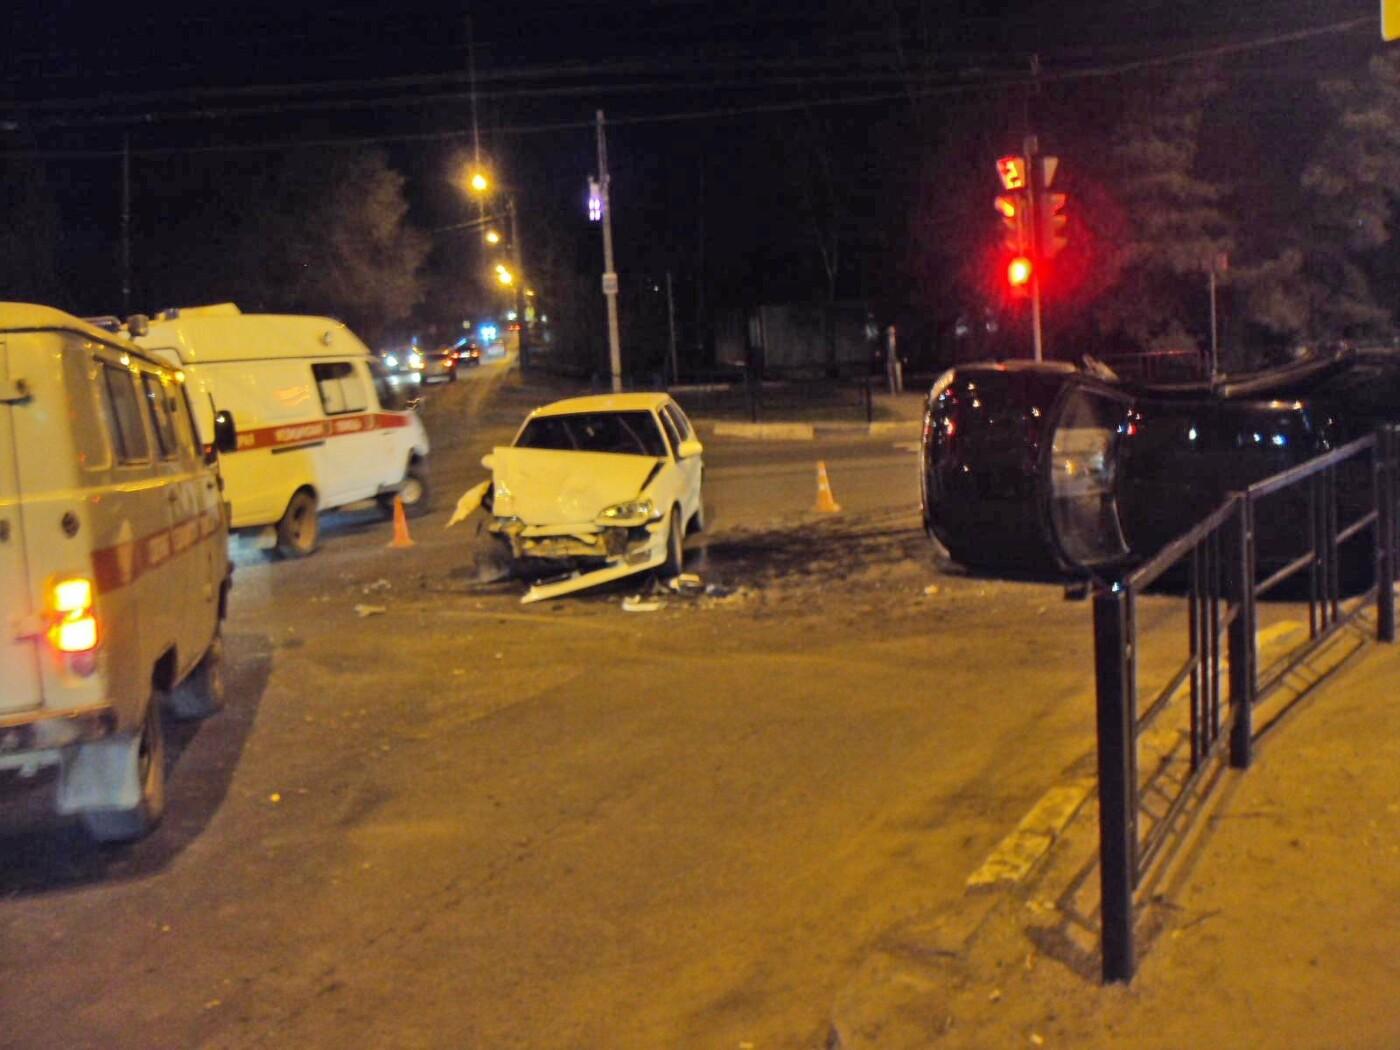 В Тамбове на улице Карла Маркса при столкновении двух легковушек пострадал человек, фото-5